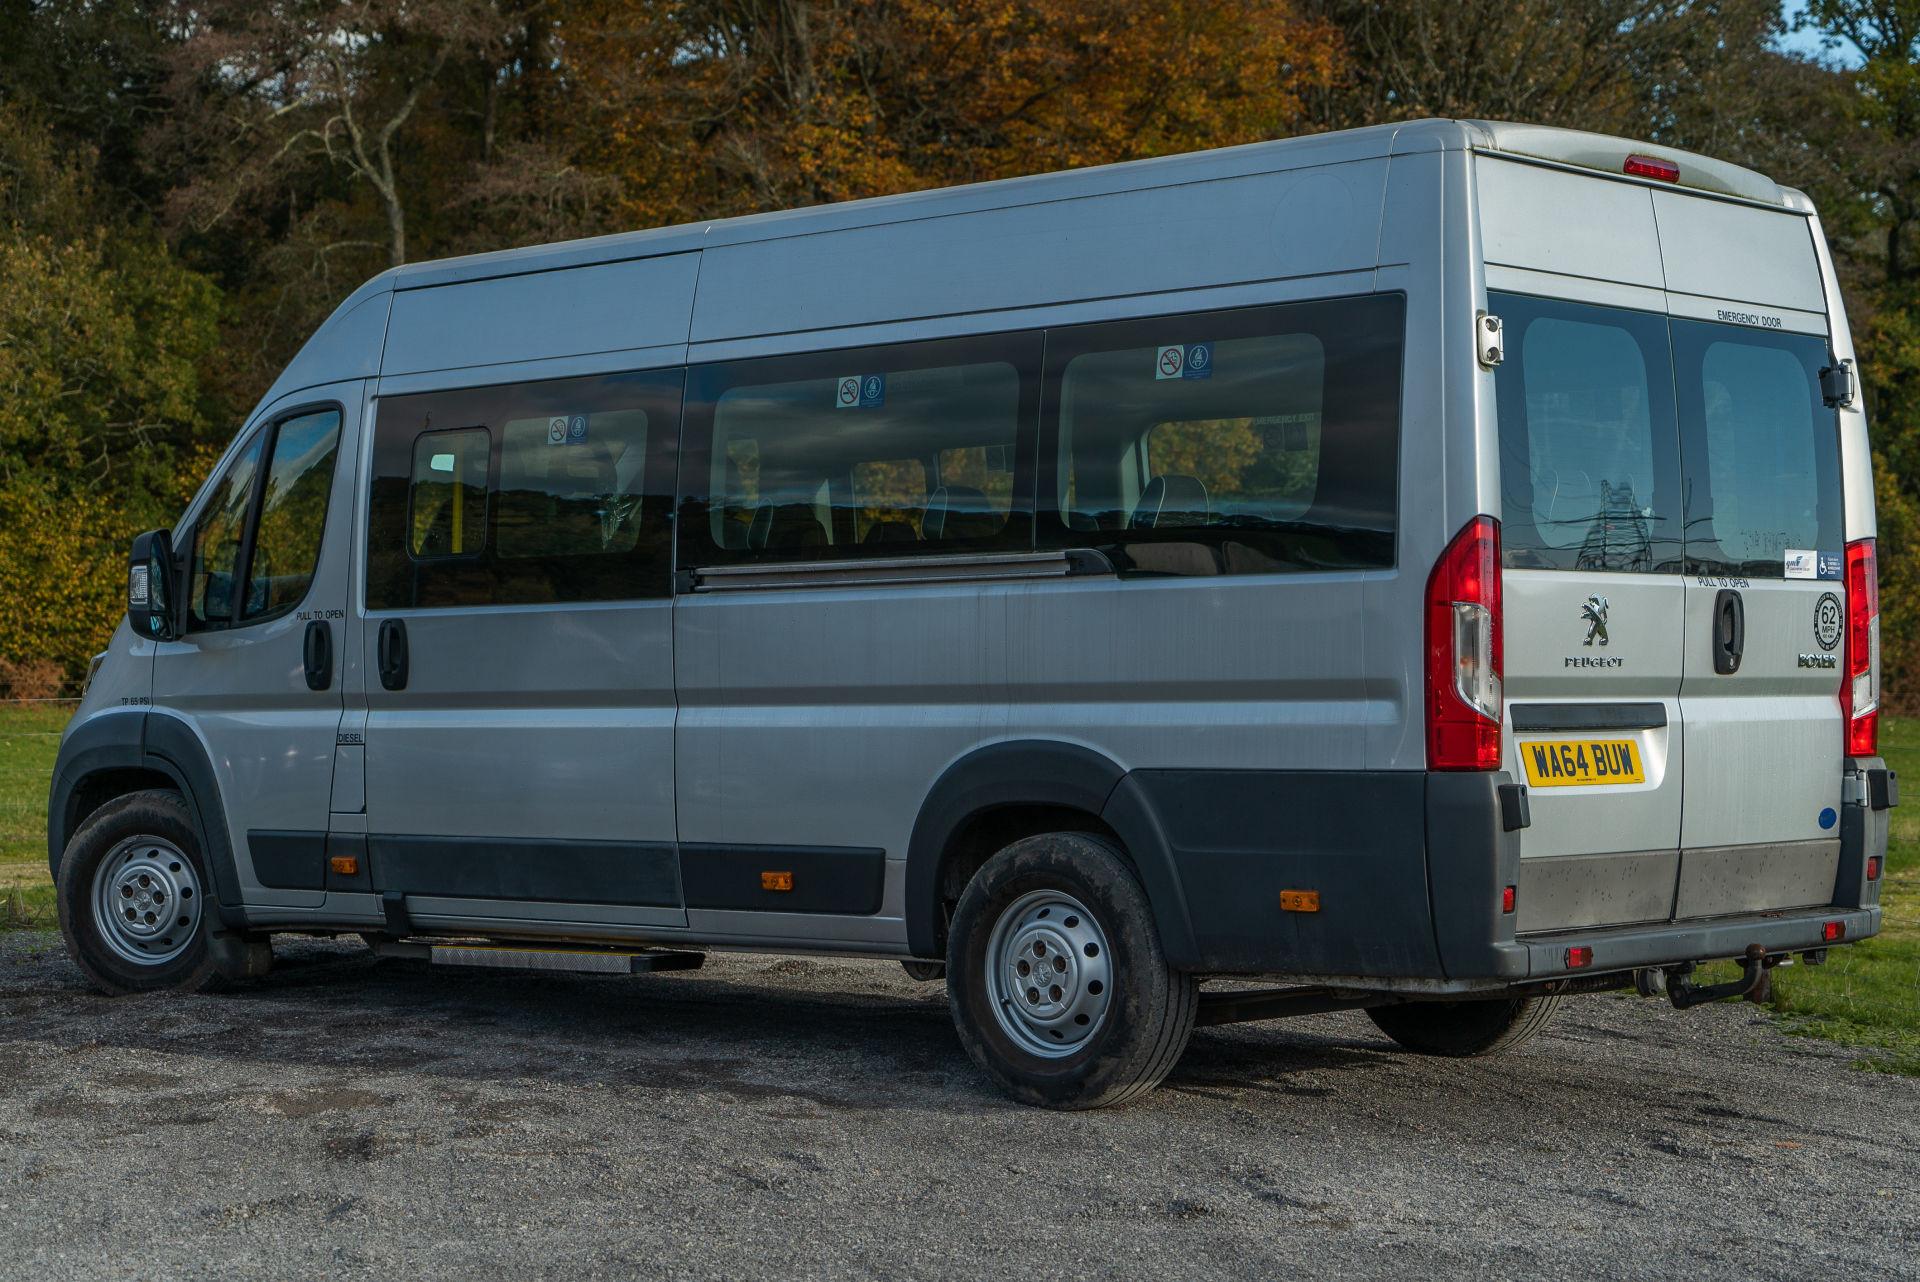 2015 Peugeot Boxer 17 Seater Accessible Minibus for Sale - Image 4